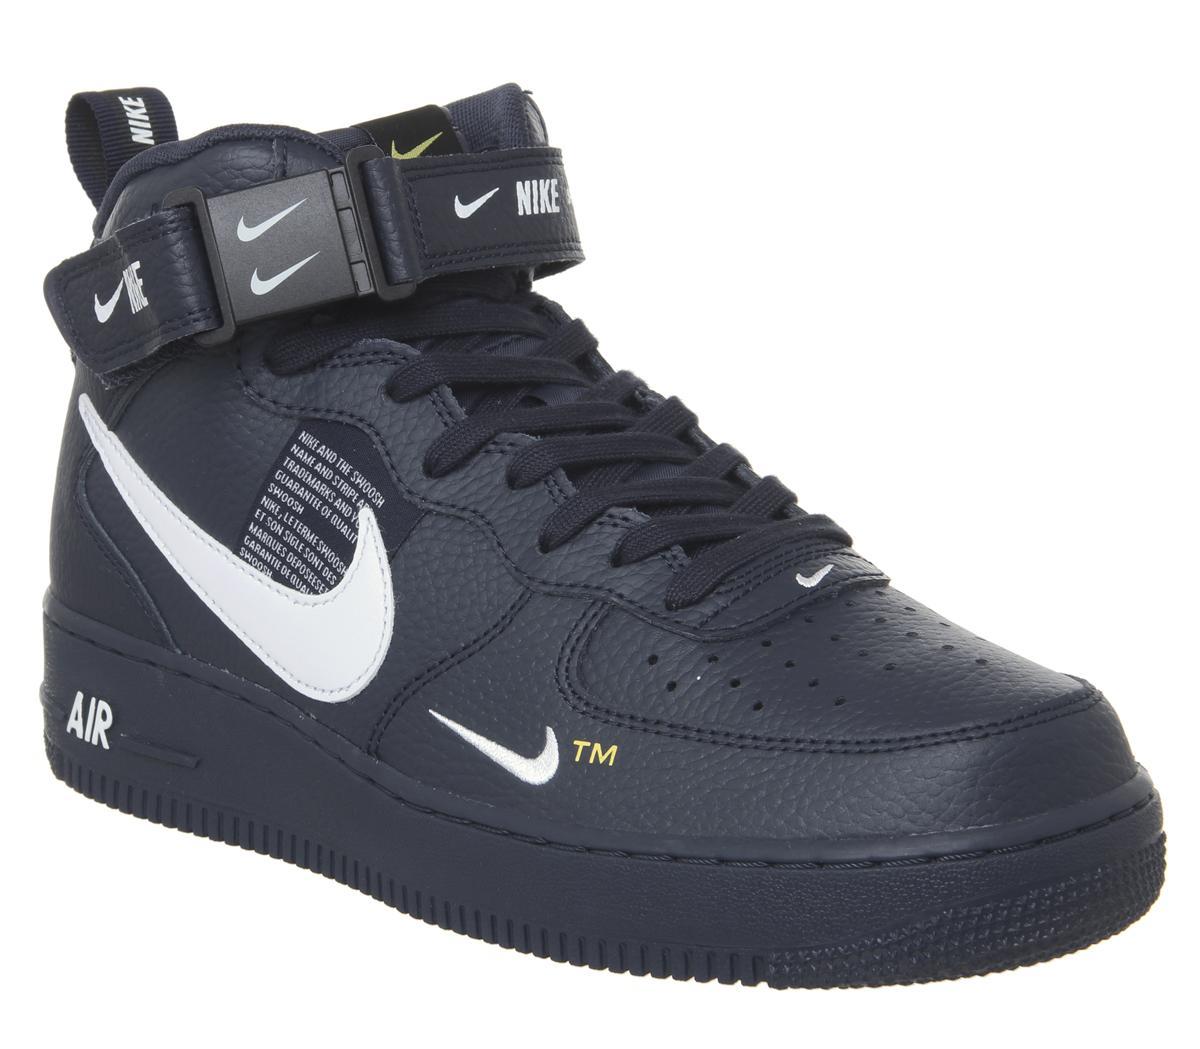 Generalmente Médico segunda mano  Nike Air Force 1 Mid Lv8 Trainers Obsidian White Black Tour Yellow - His  trainers